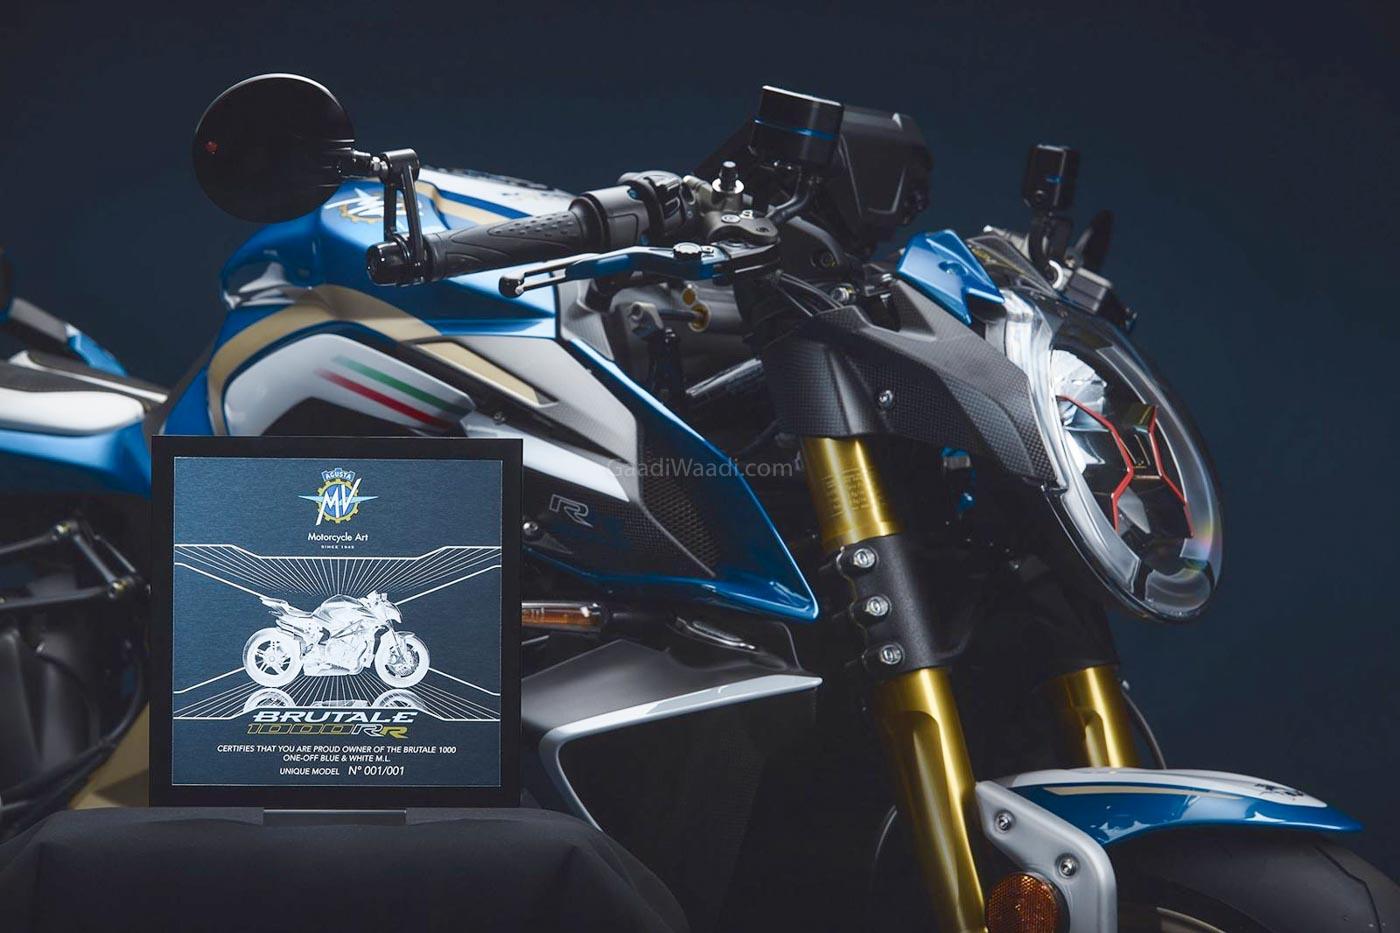 MV Agusta Brutale 1000 RR presented › Motorcycles.News